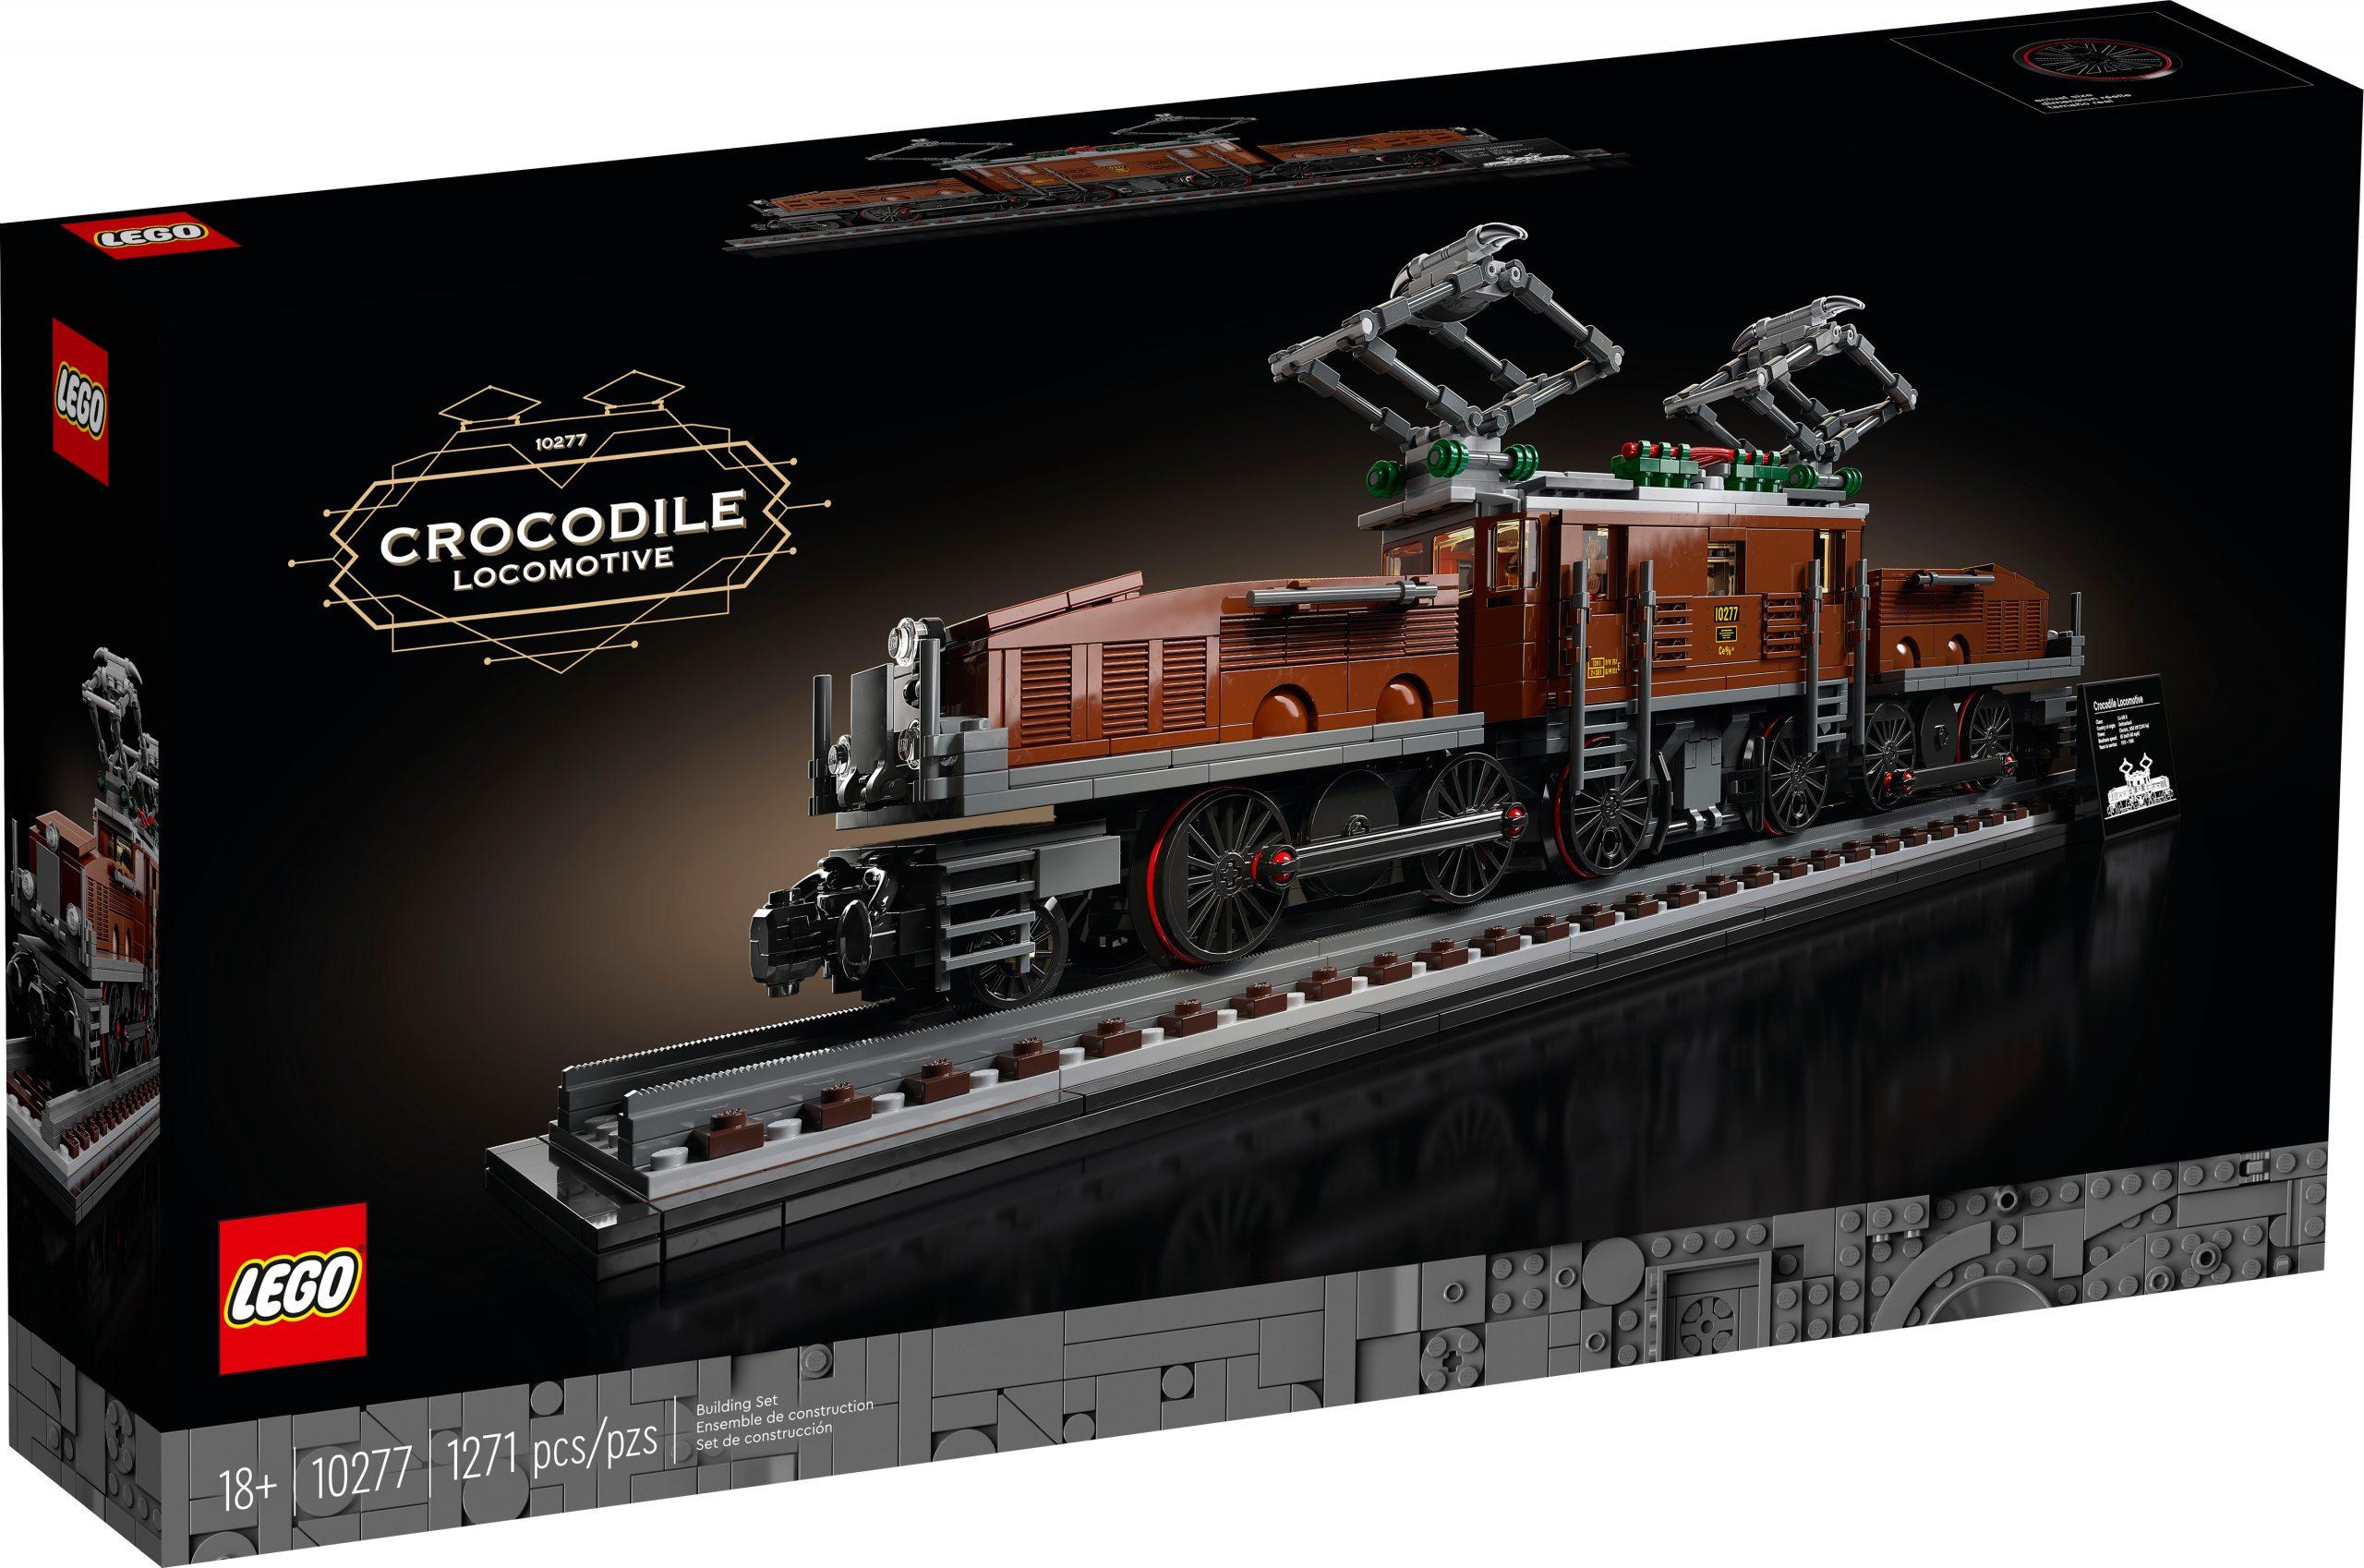 lego 10277 la locomotive crocodile scaled